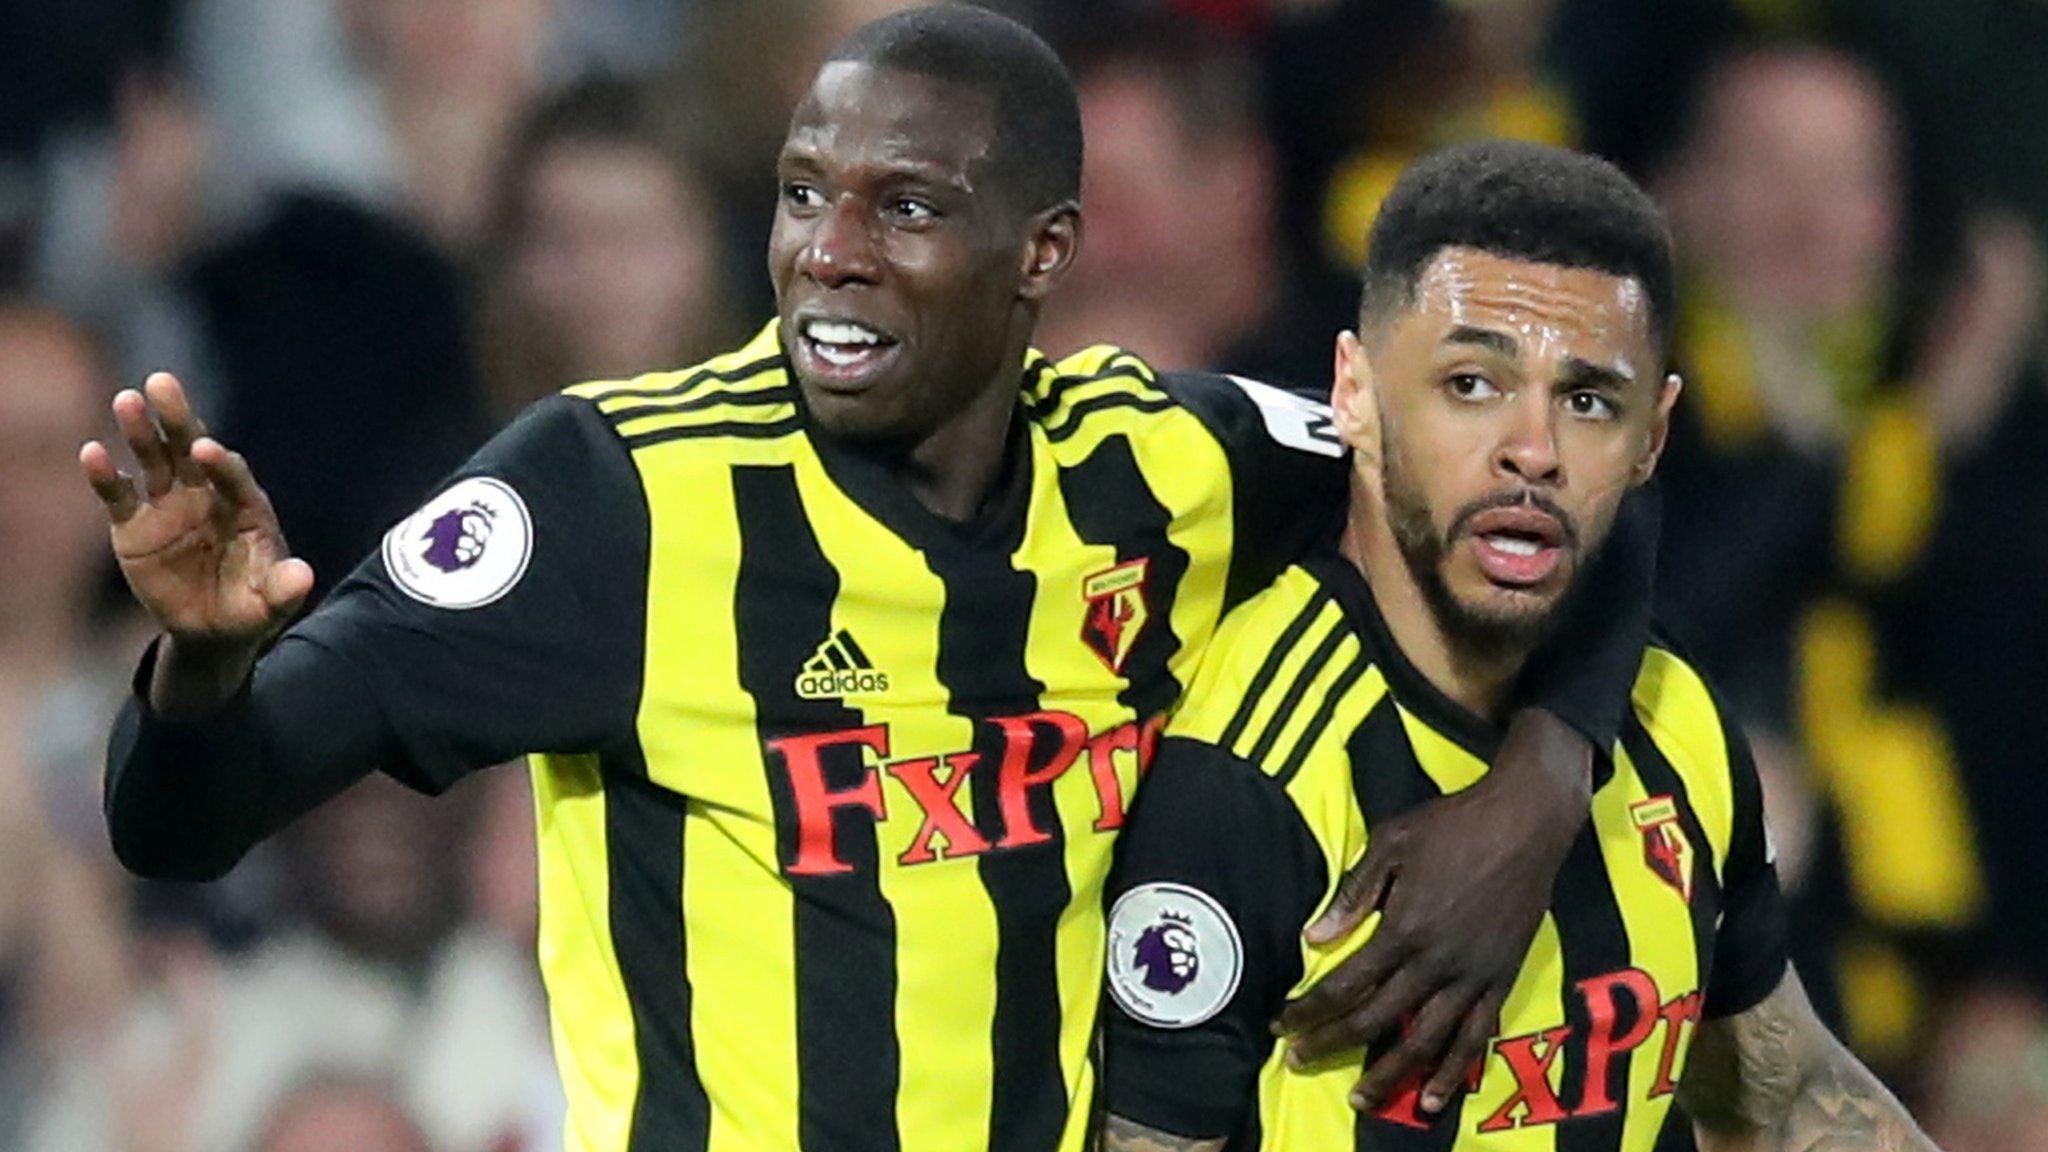 Watford 1-1 Southampton: Late Gray goal earns Watford point